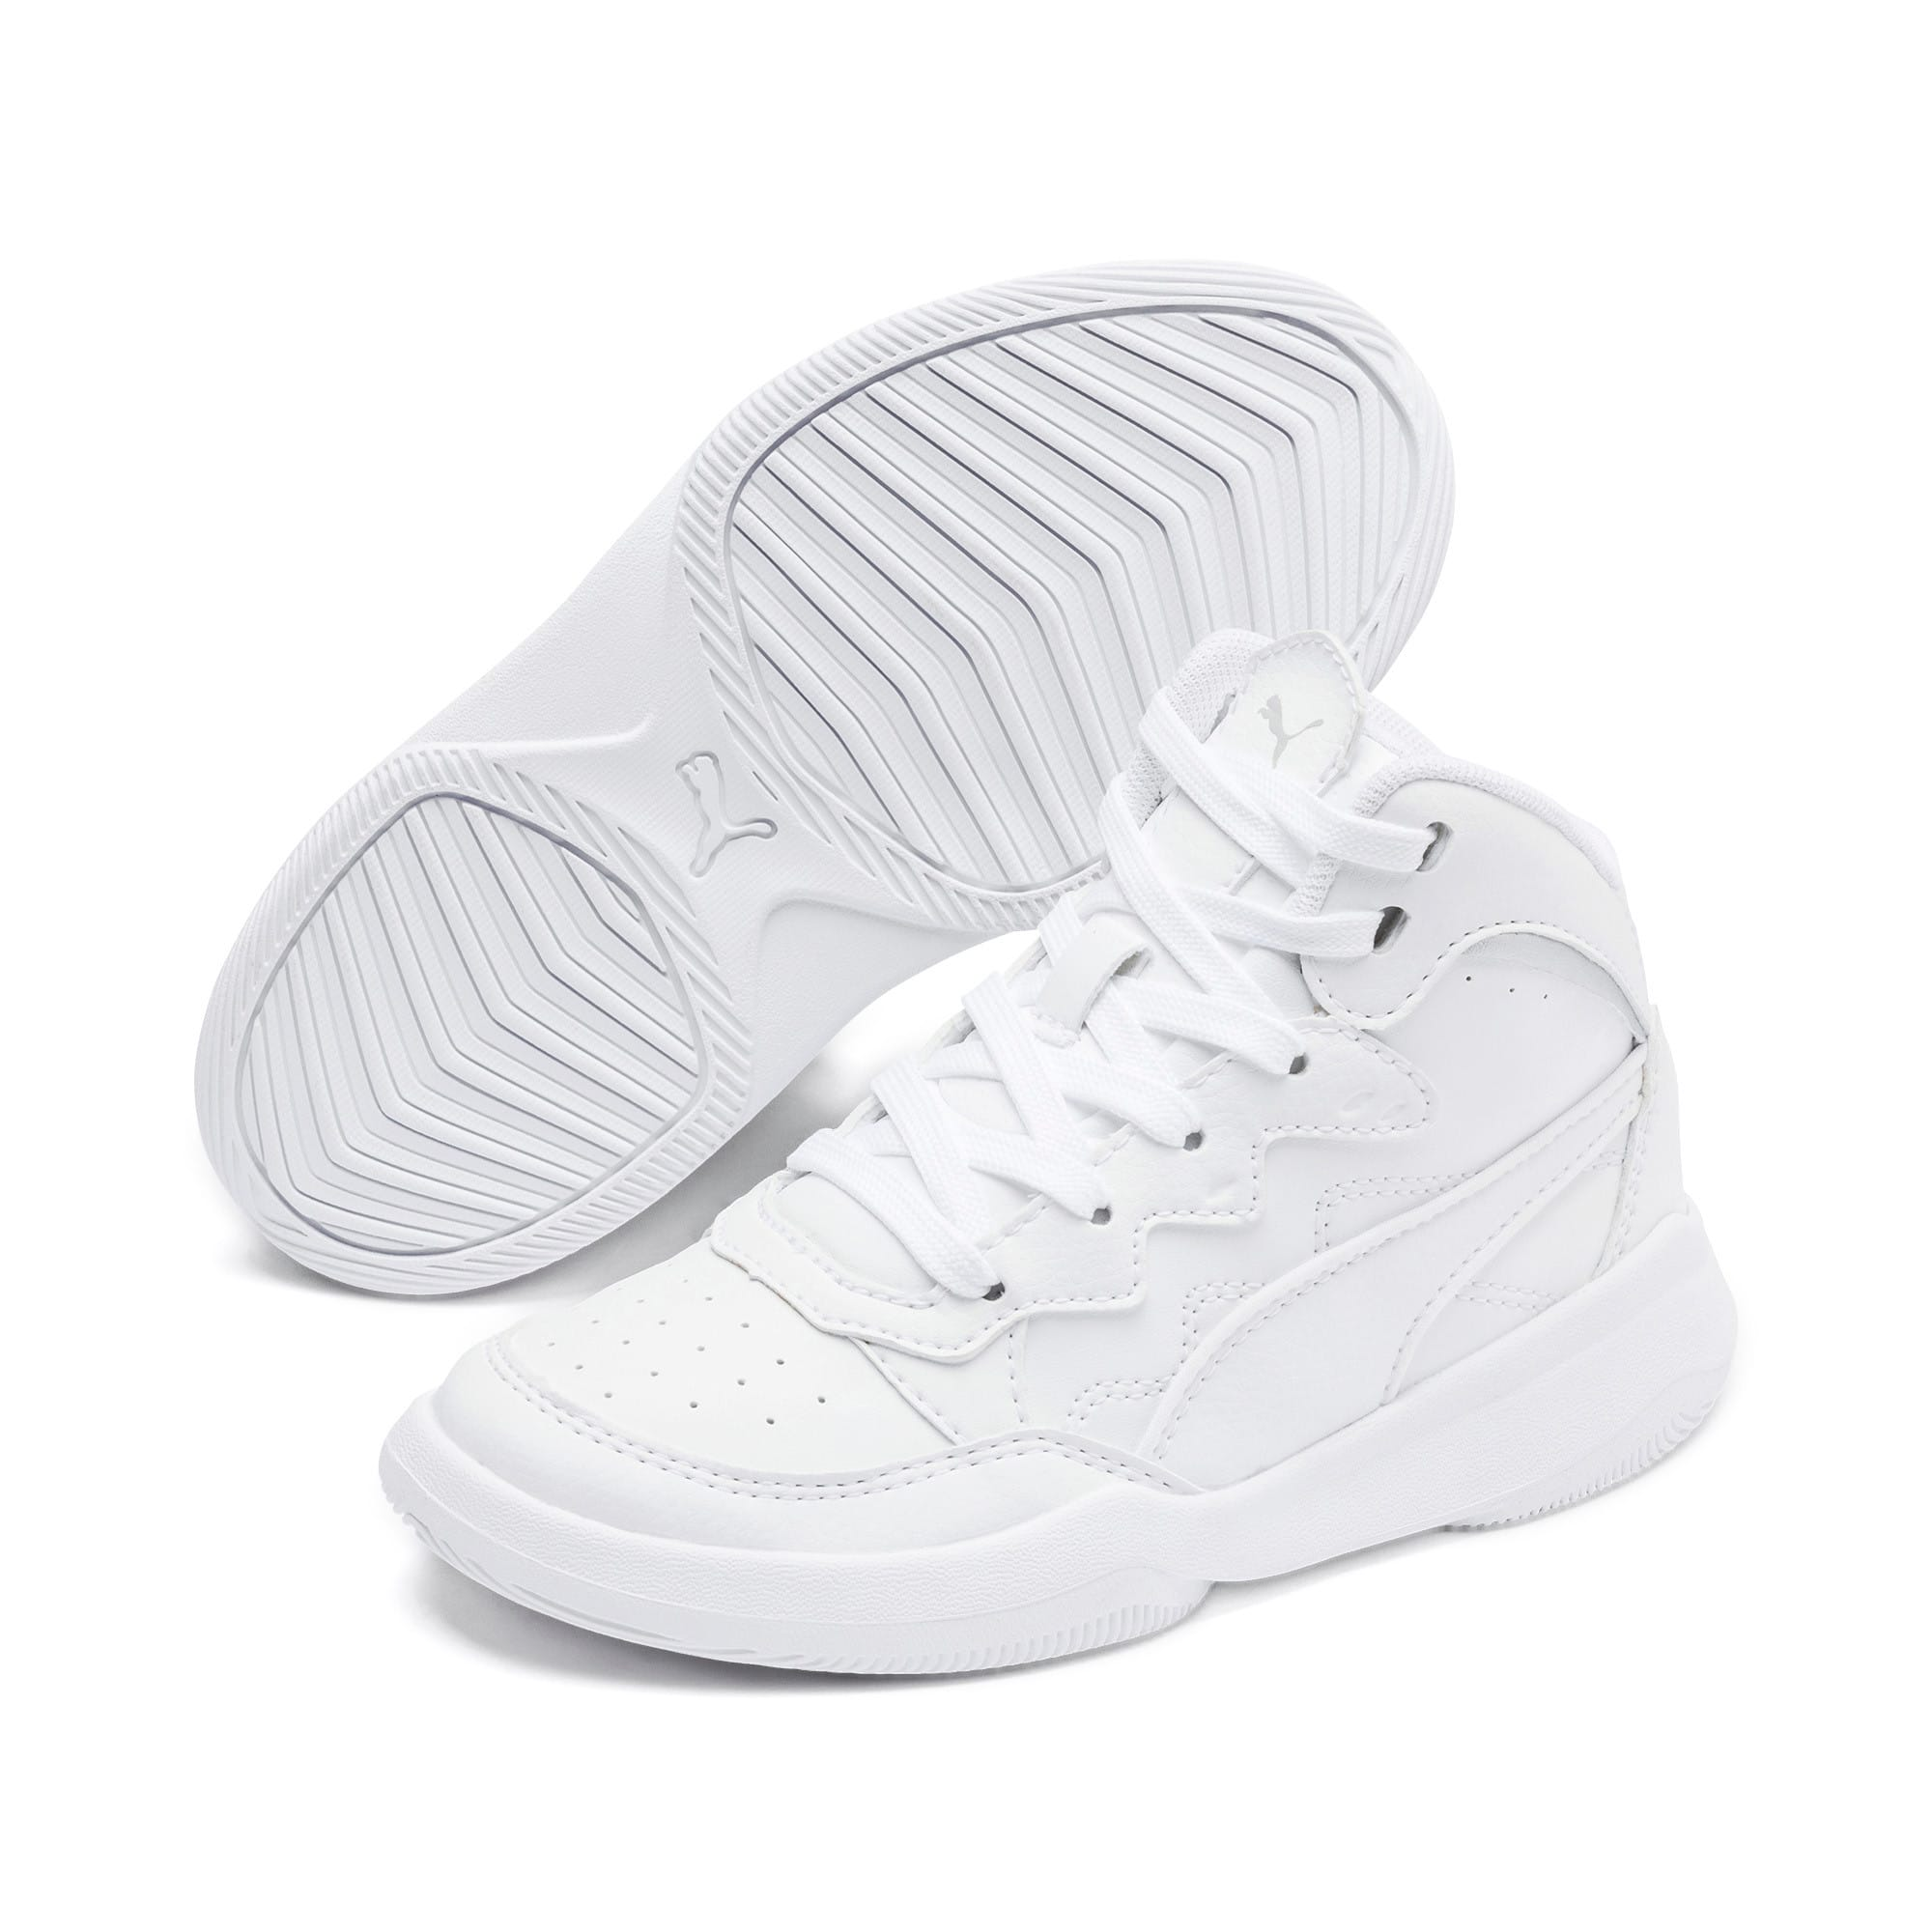 Thumbnail 2 of PUMA Rebound Playoff SL Little Kids' Shoes, Puma White-Puma Silver, medium